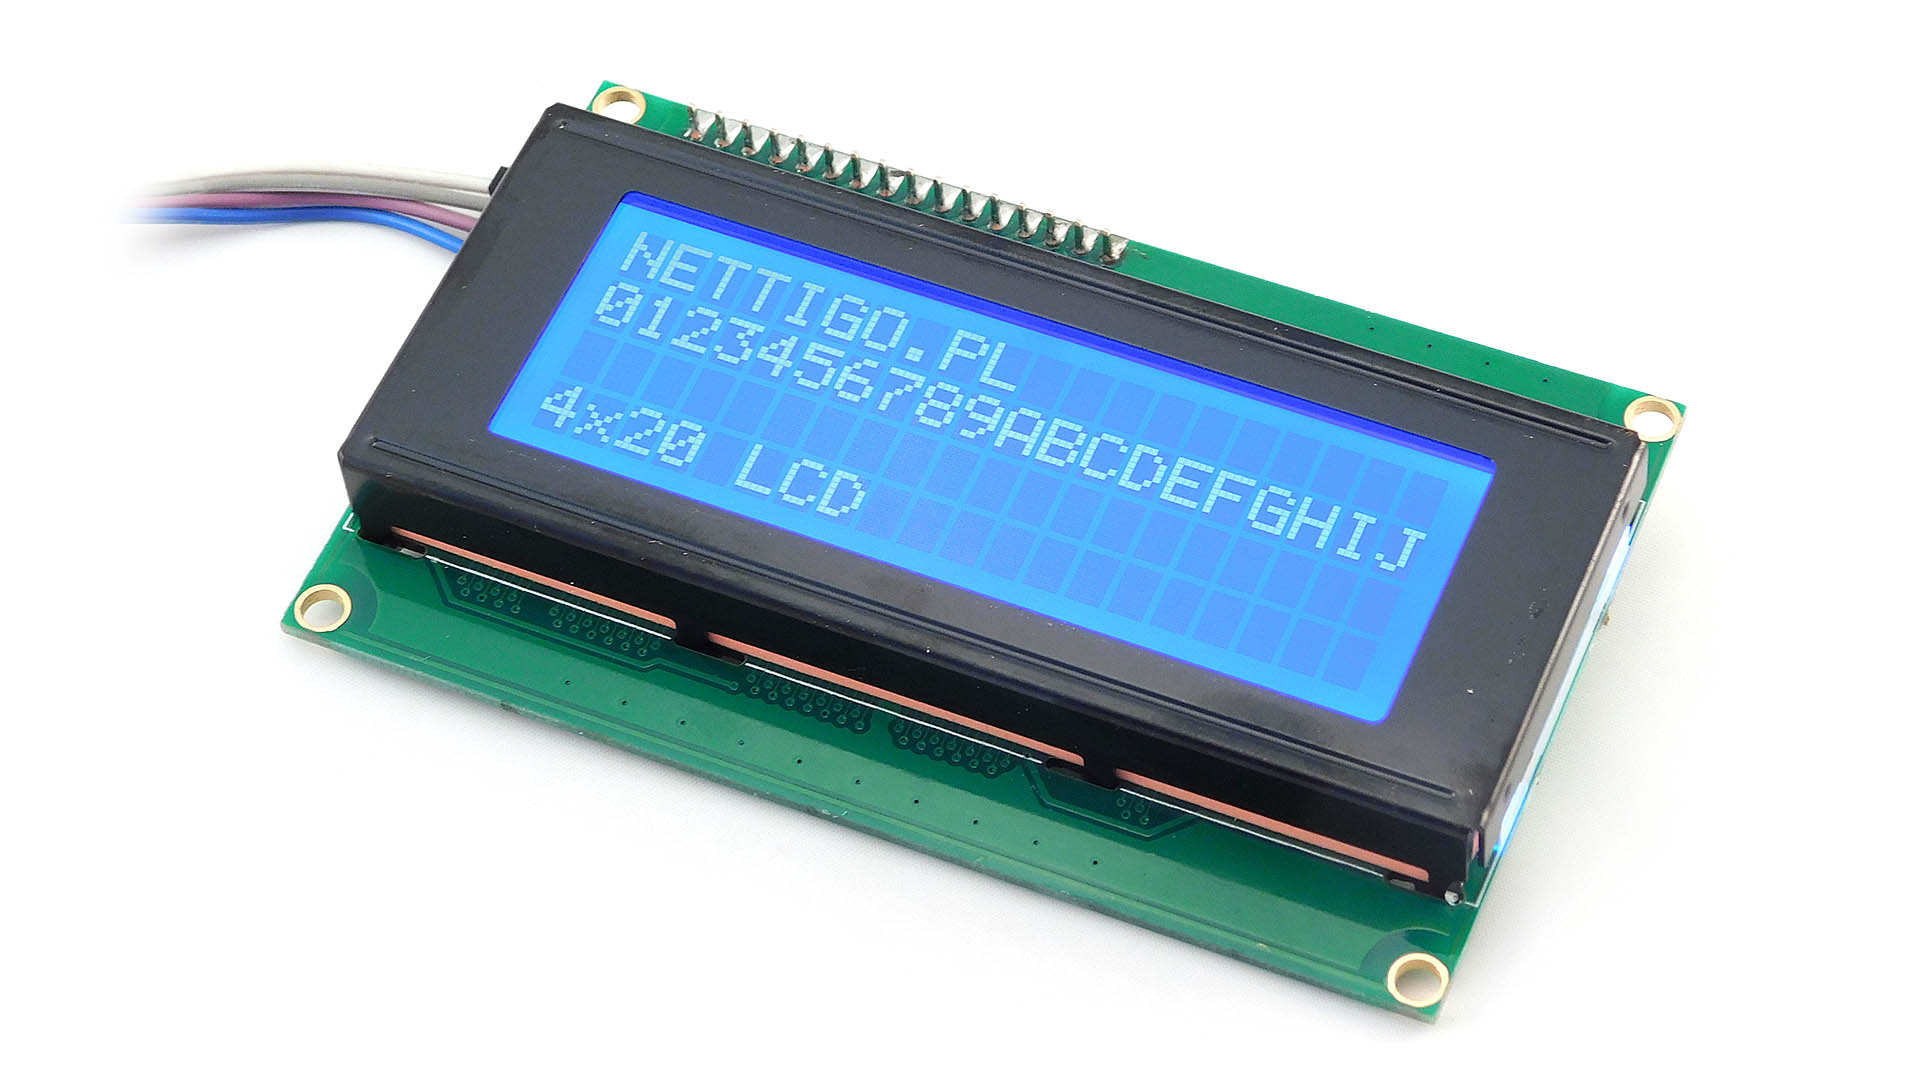 Nettigo: LCD 4x20 I2C blue